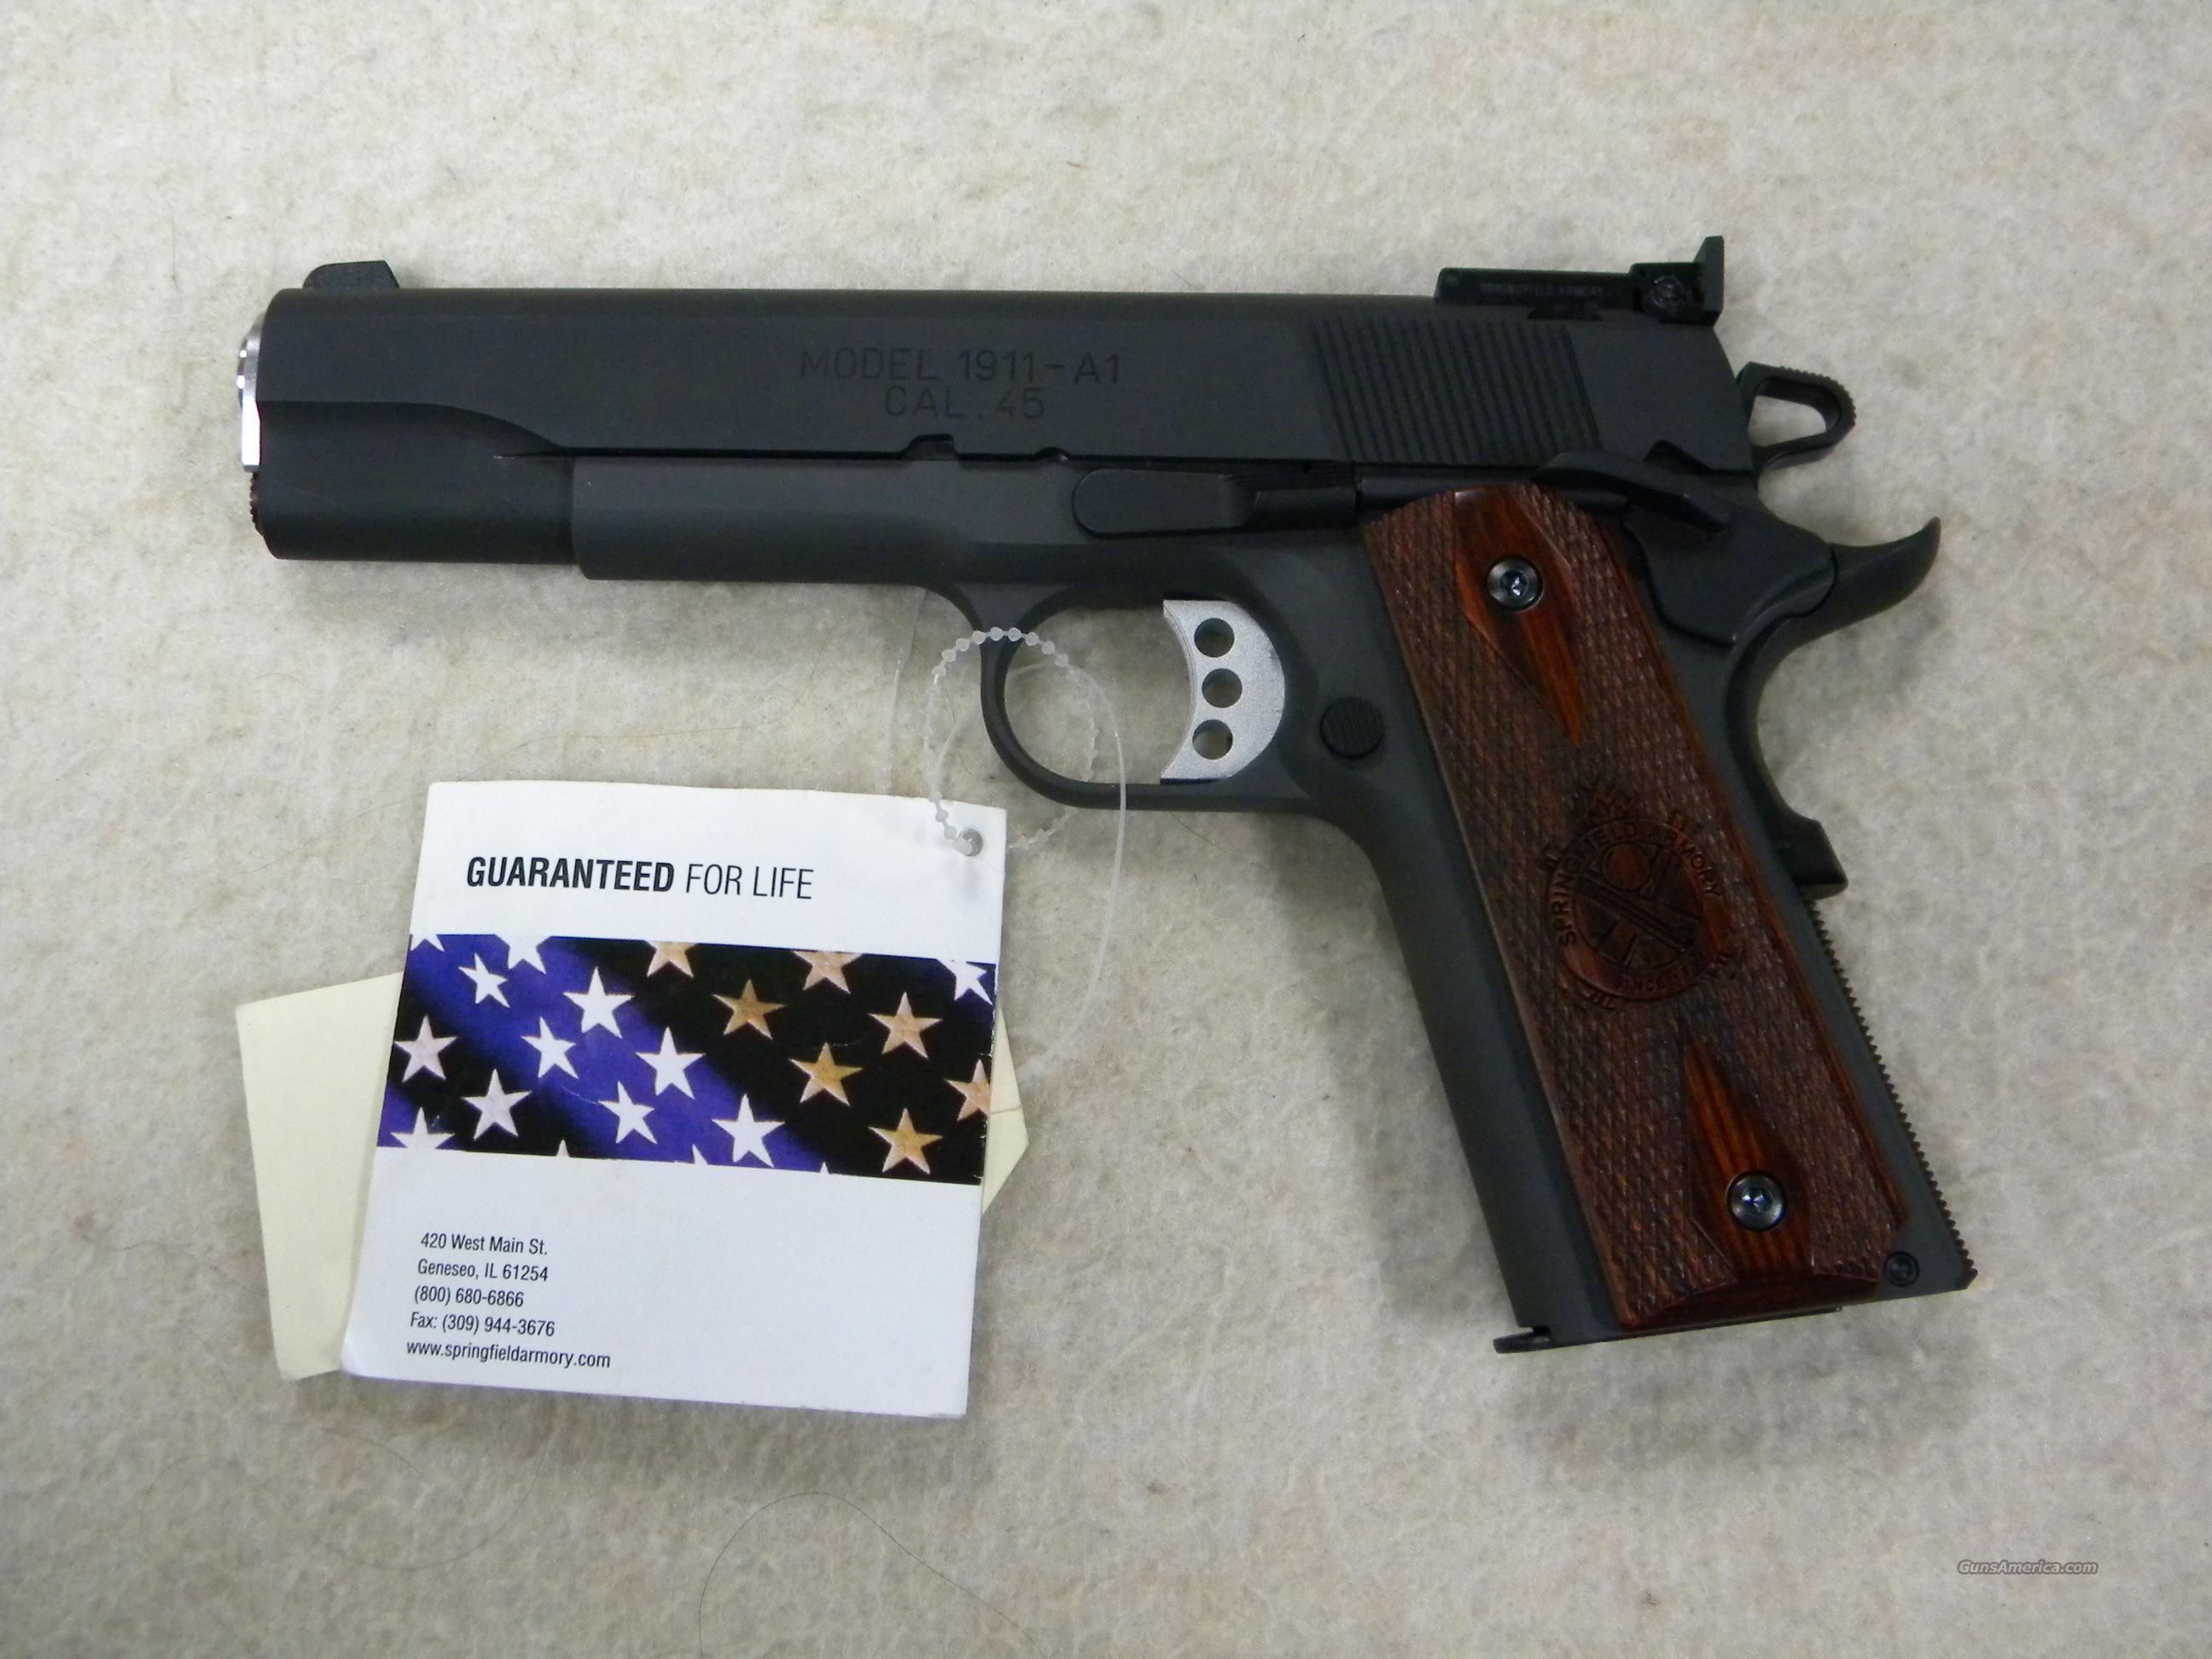 Springfield Armory 1911-A1 'Range Officer', .45 ACP  Guns > Pistols > Springfield Armory Pistols > 1911 Type